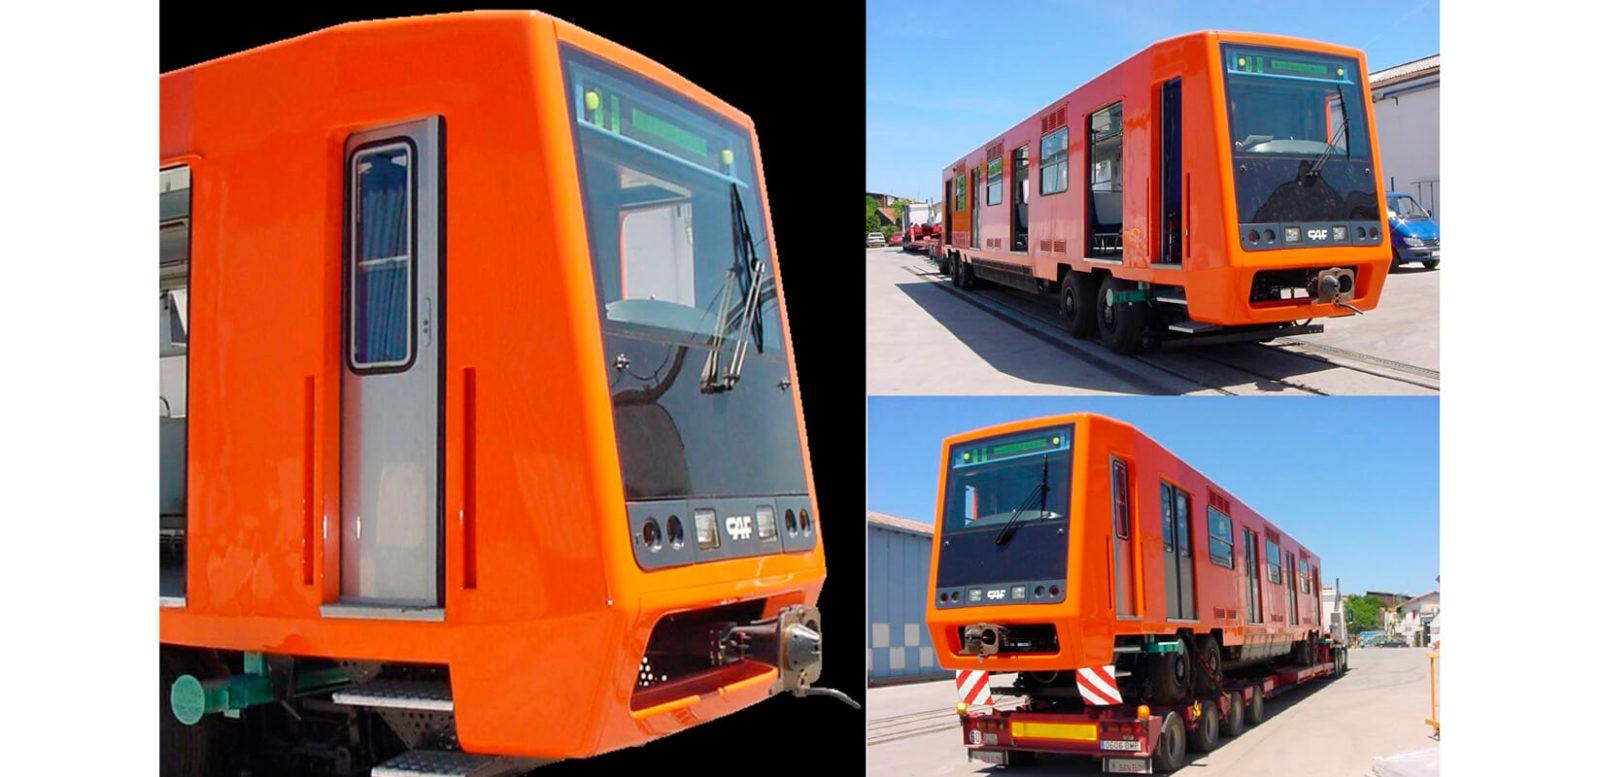 Metro_Units_Railcars_Tailored_engineering_Mexico_Idom_ADA_01_1600x800